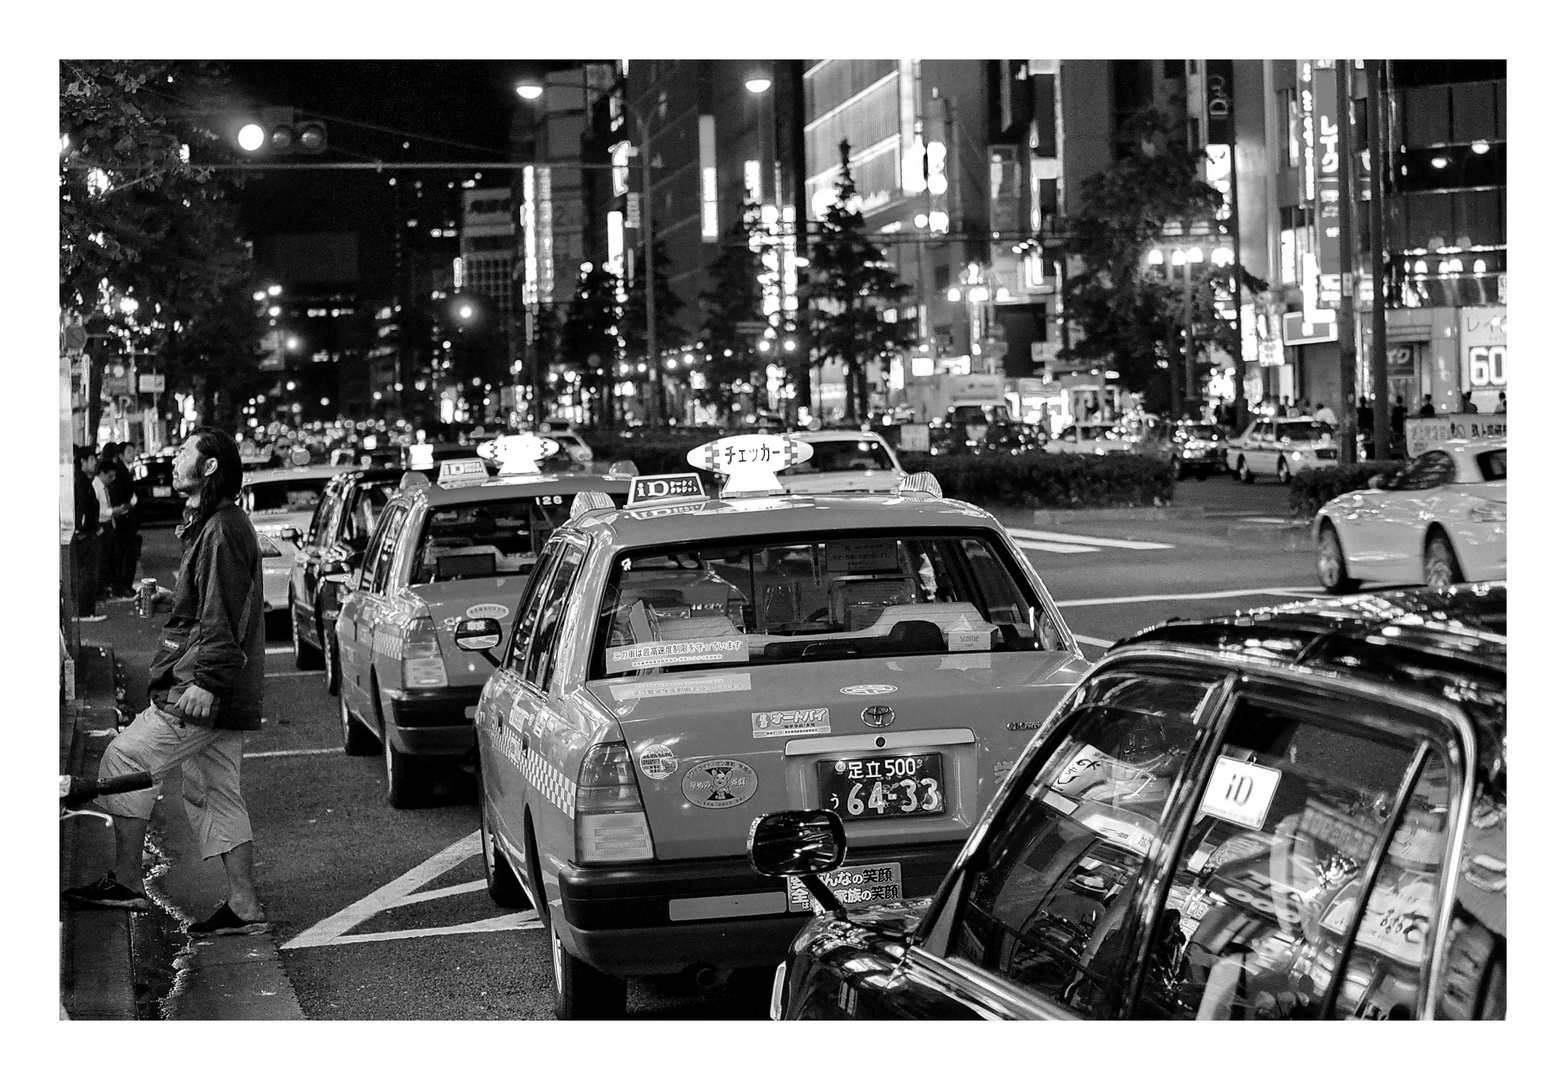 Takushi - Tokyo